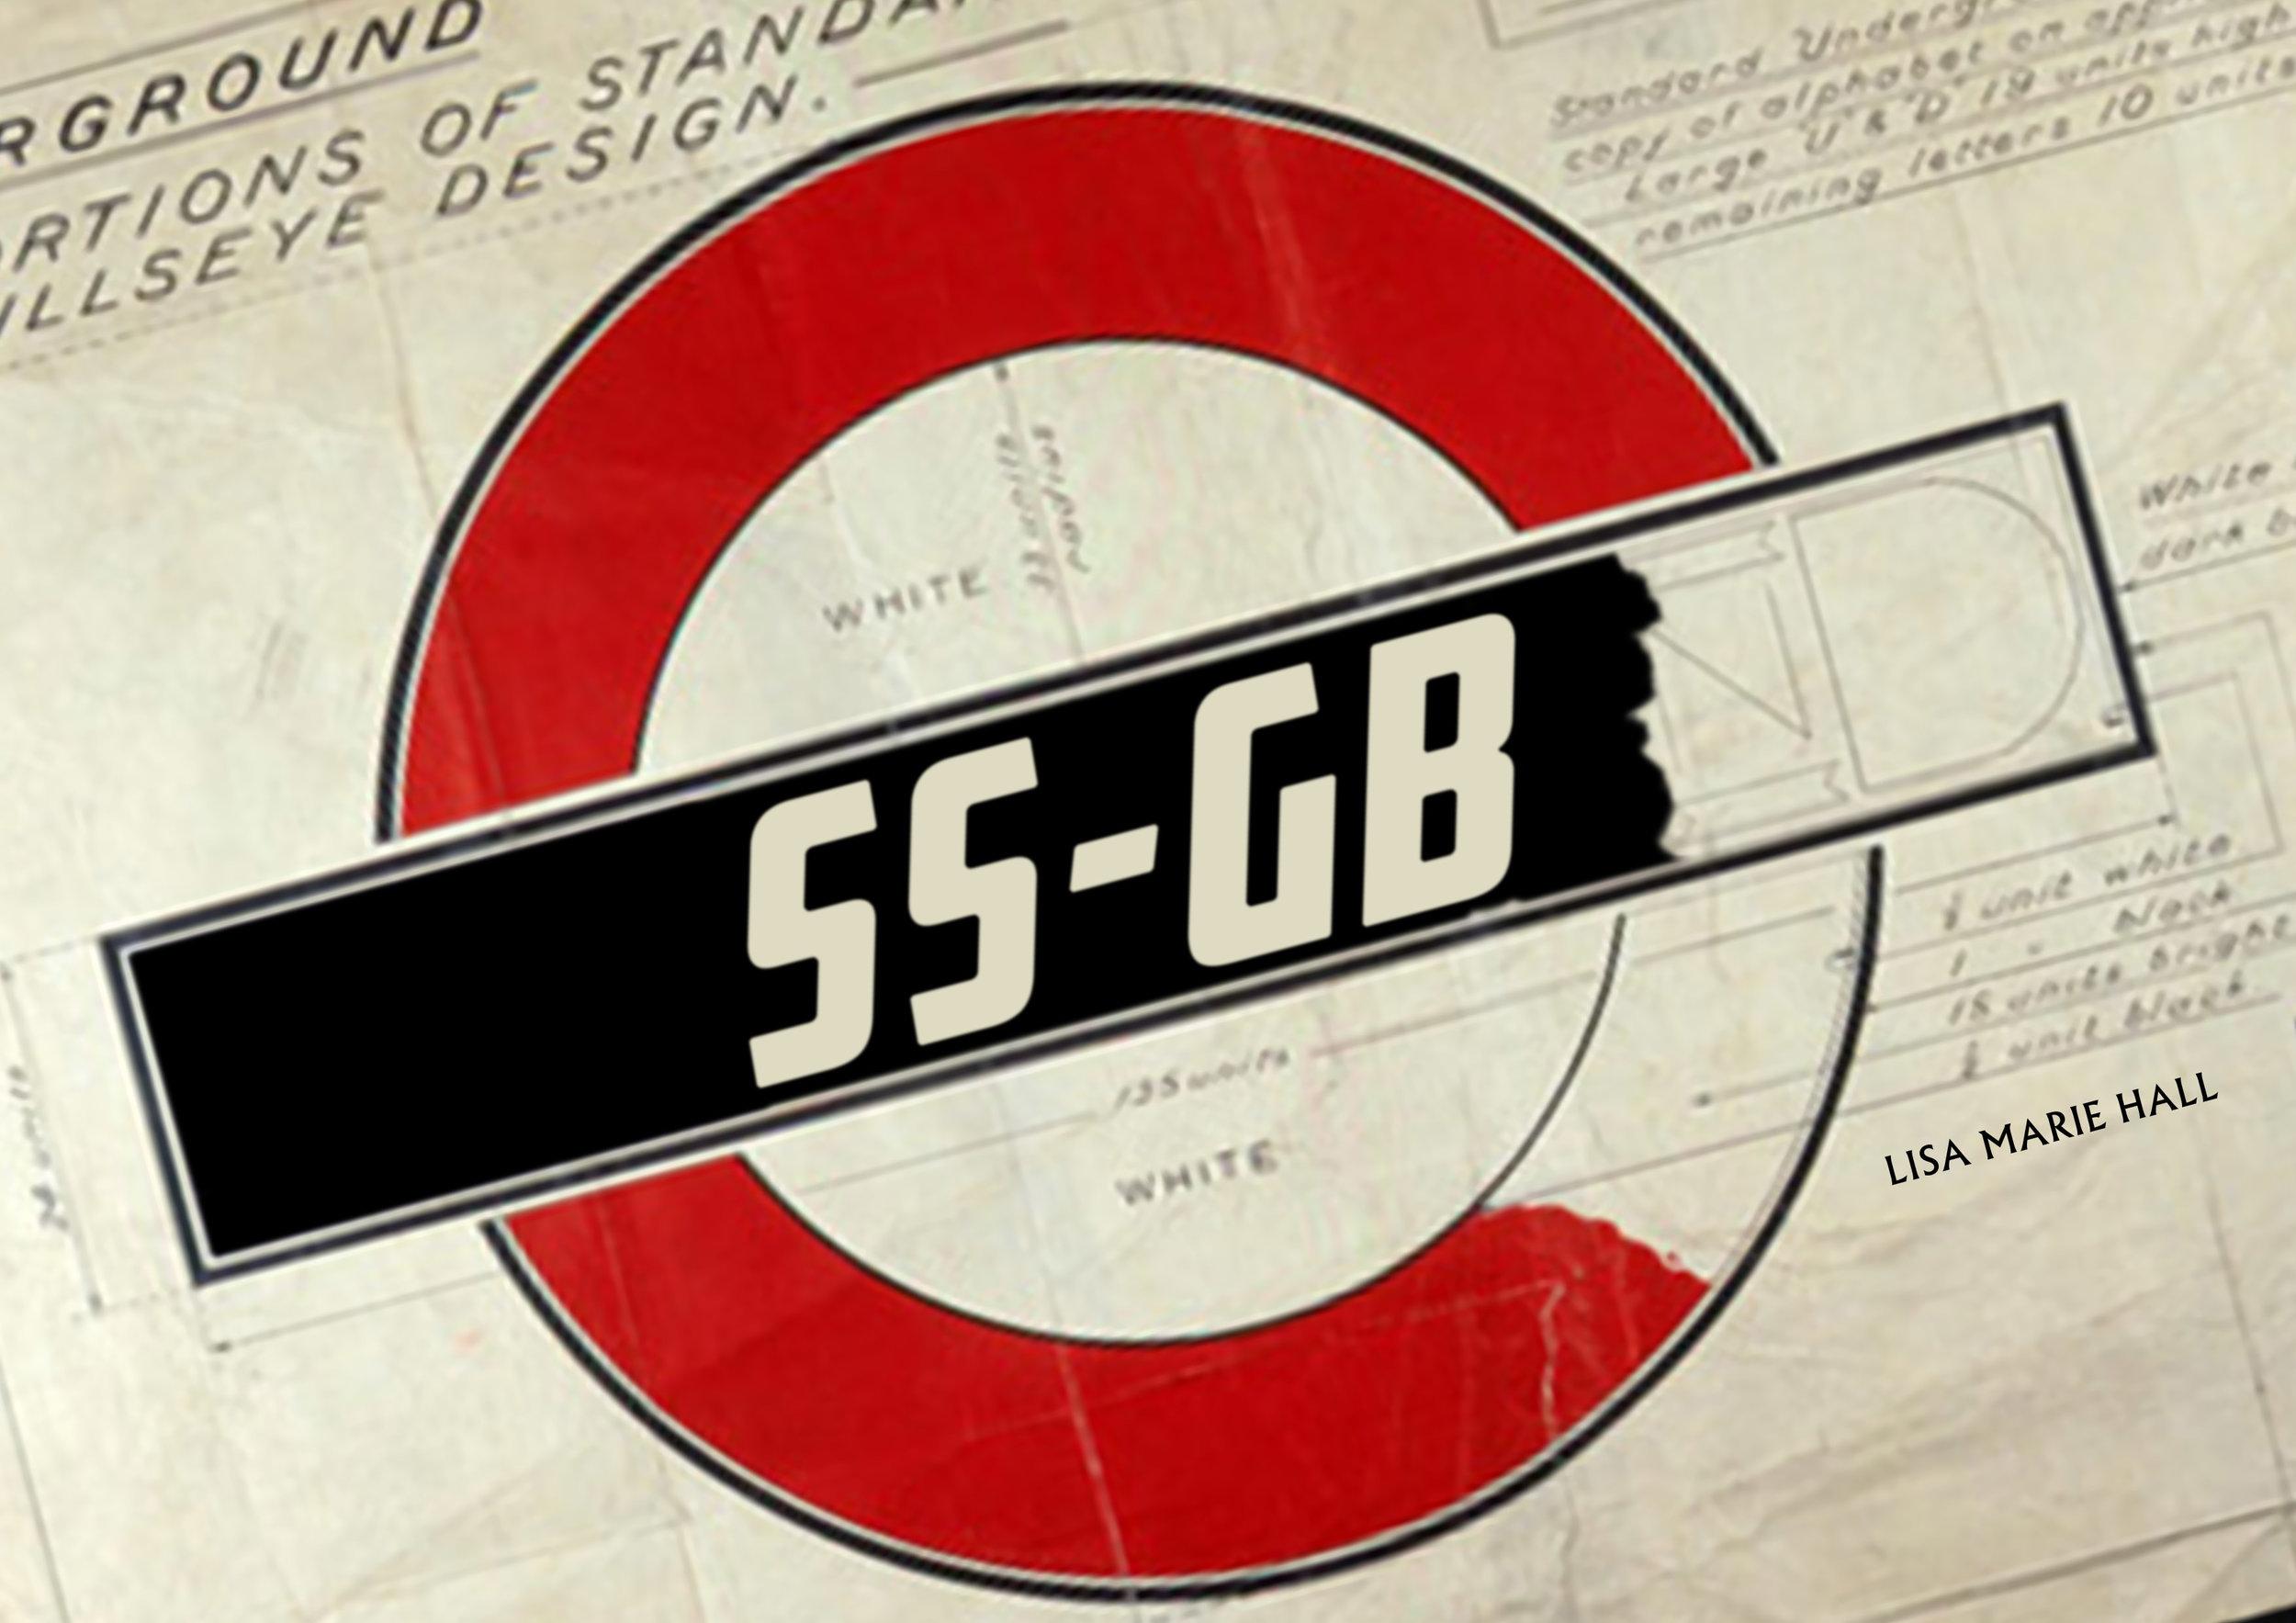 ss-gb-page.jpg